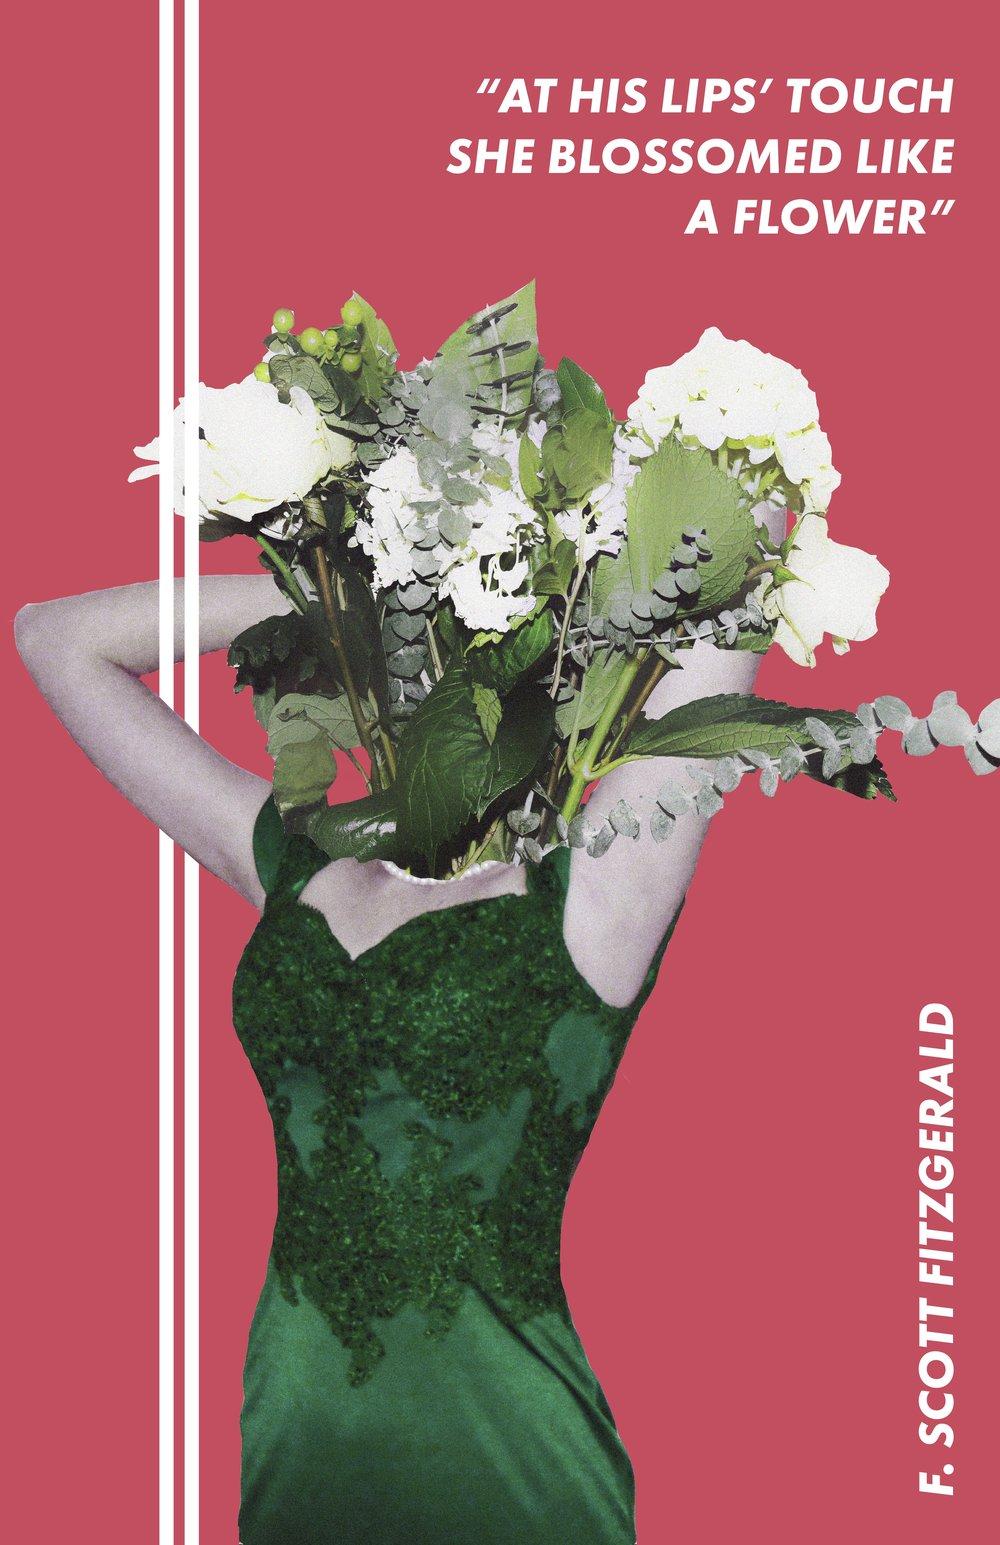 Blossom (Collage/Digital, 11x17)